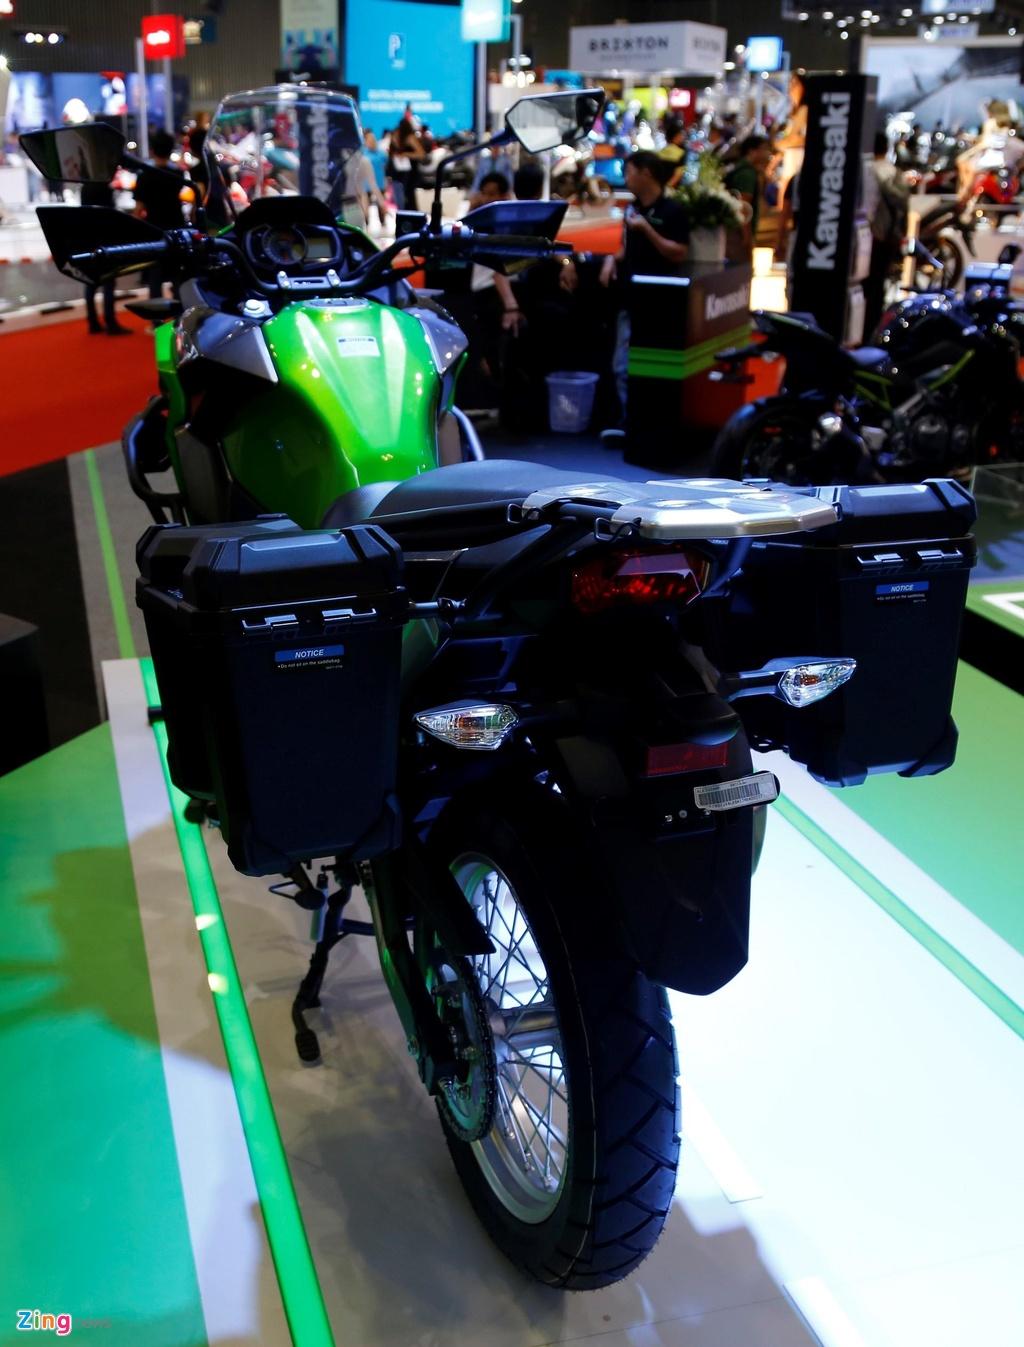 Nhung mau moto duoi 500 cc phuot thu Viet co the can nhac khi chon mua hinh anh 14